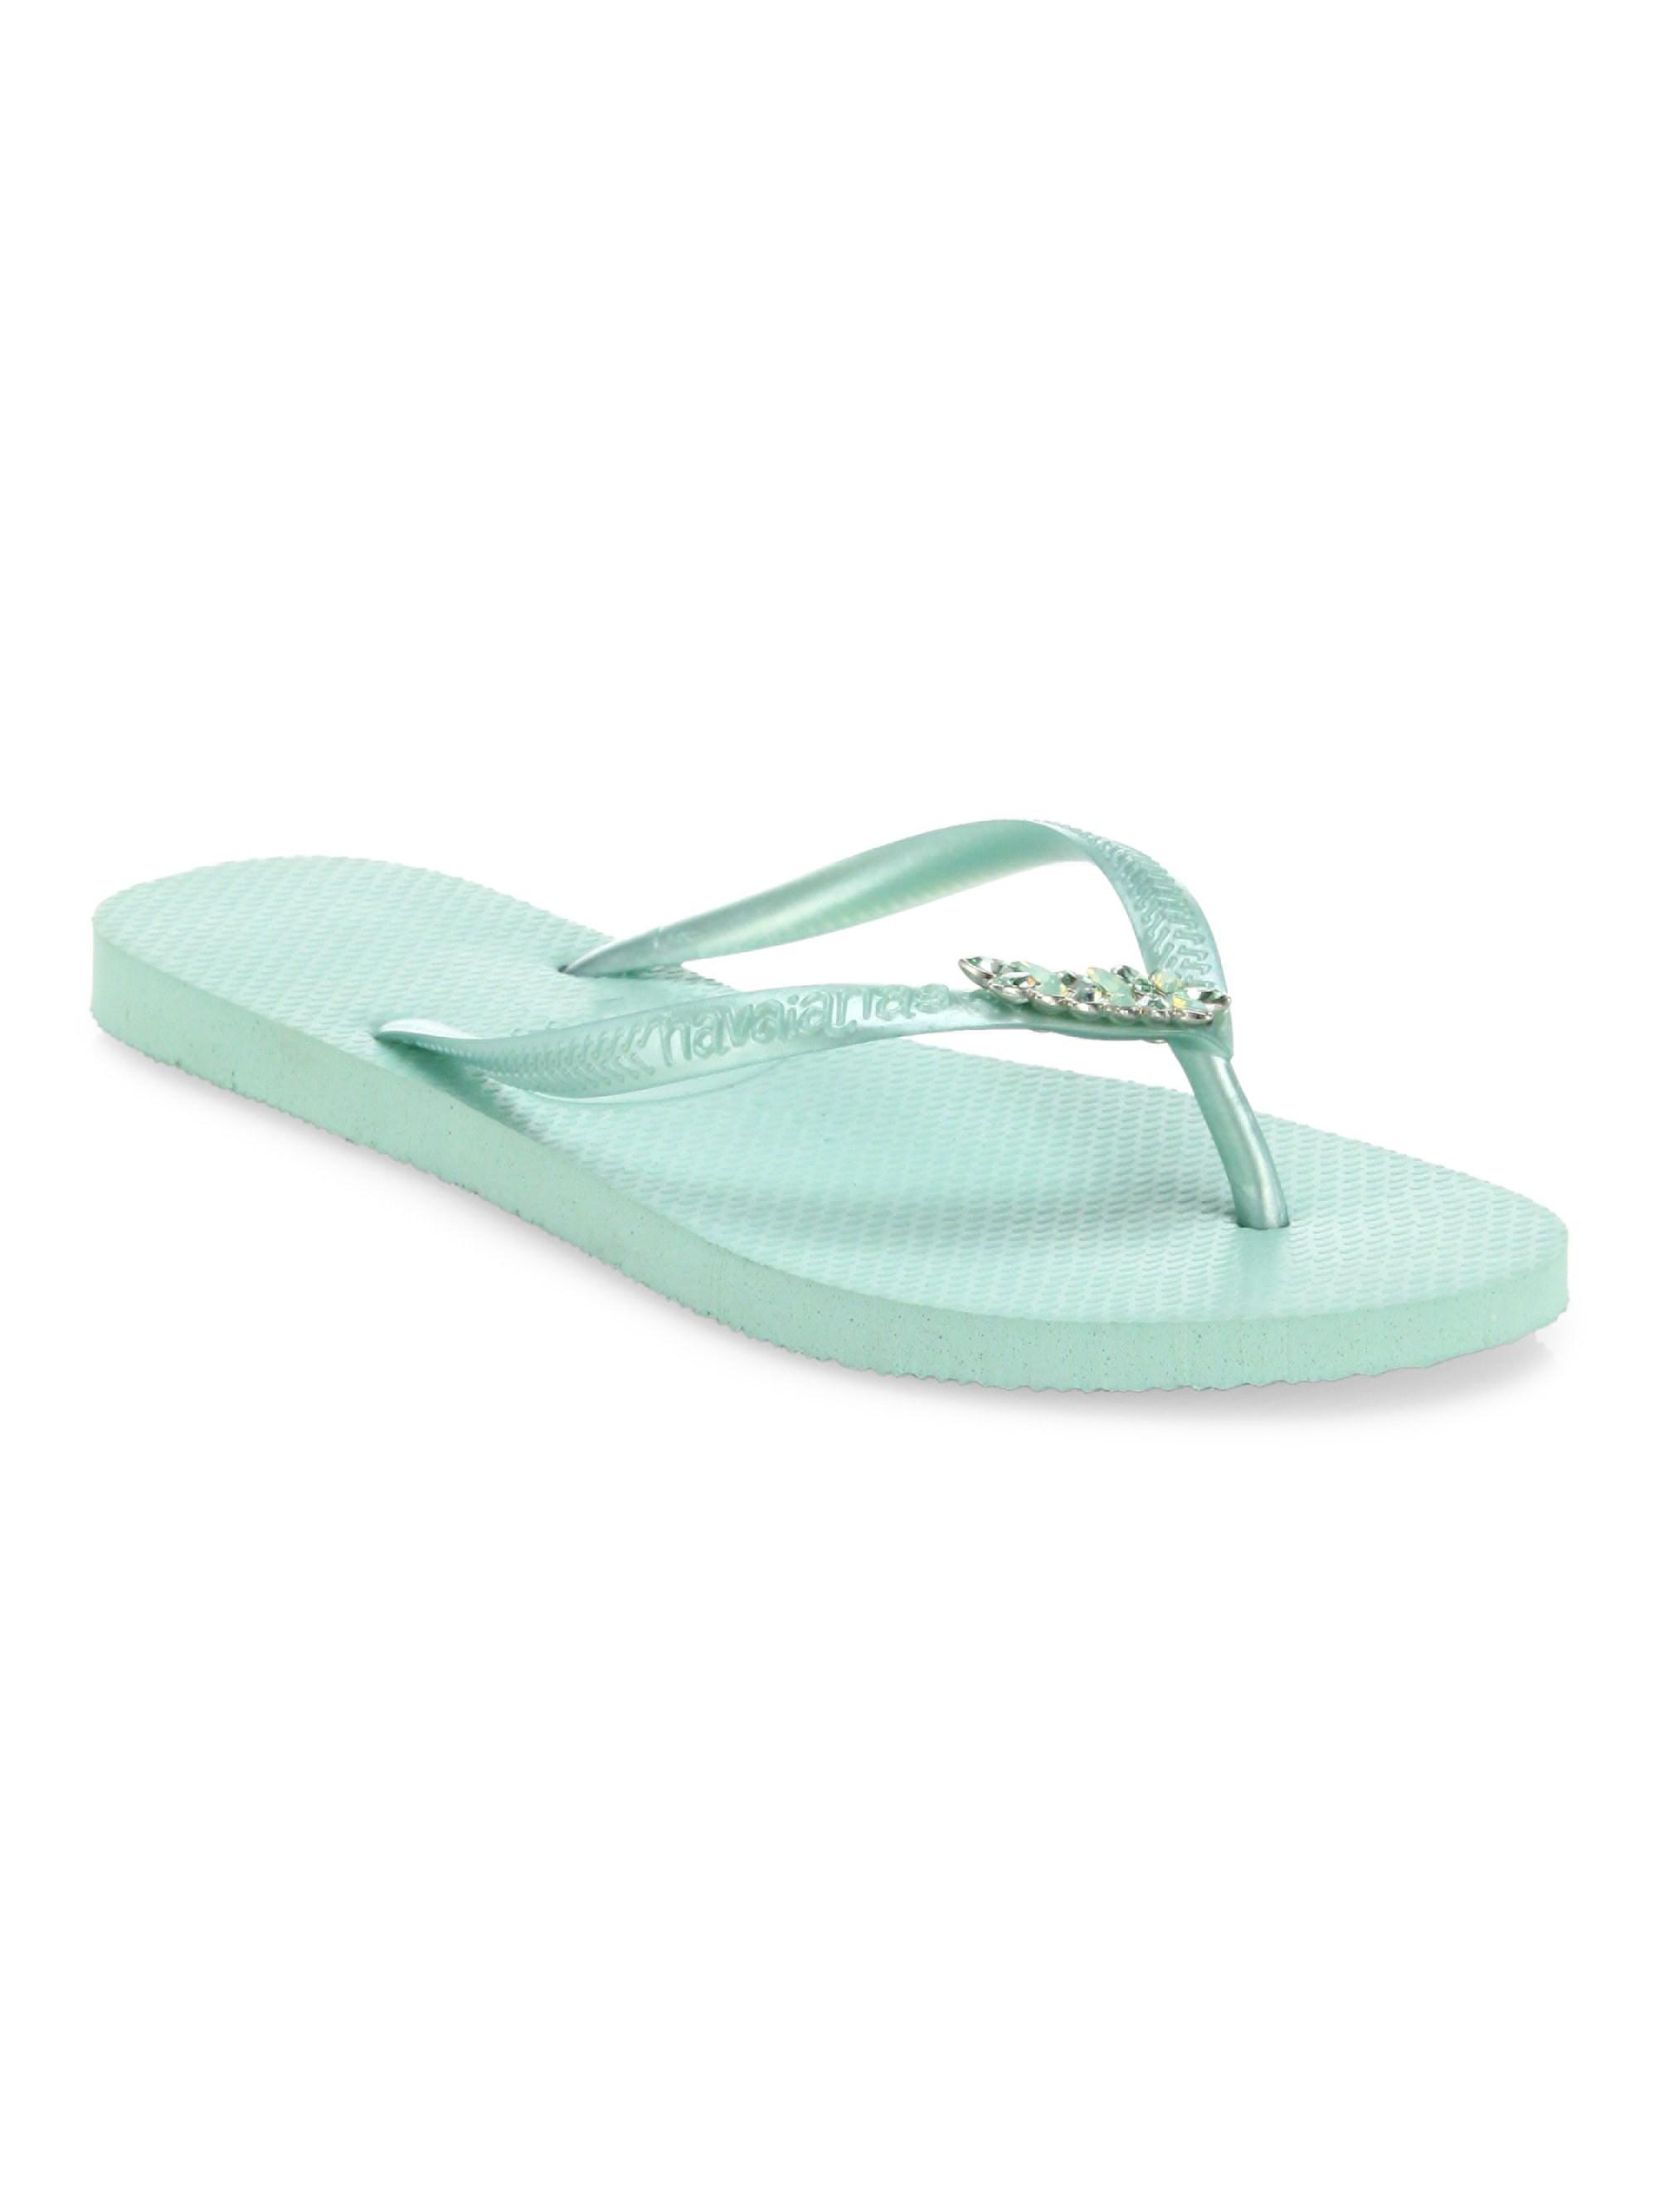 3af43e7f9 Havaianas Women s Slim Lux Swarovski Crystal Flip Flops - Sand ...